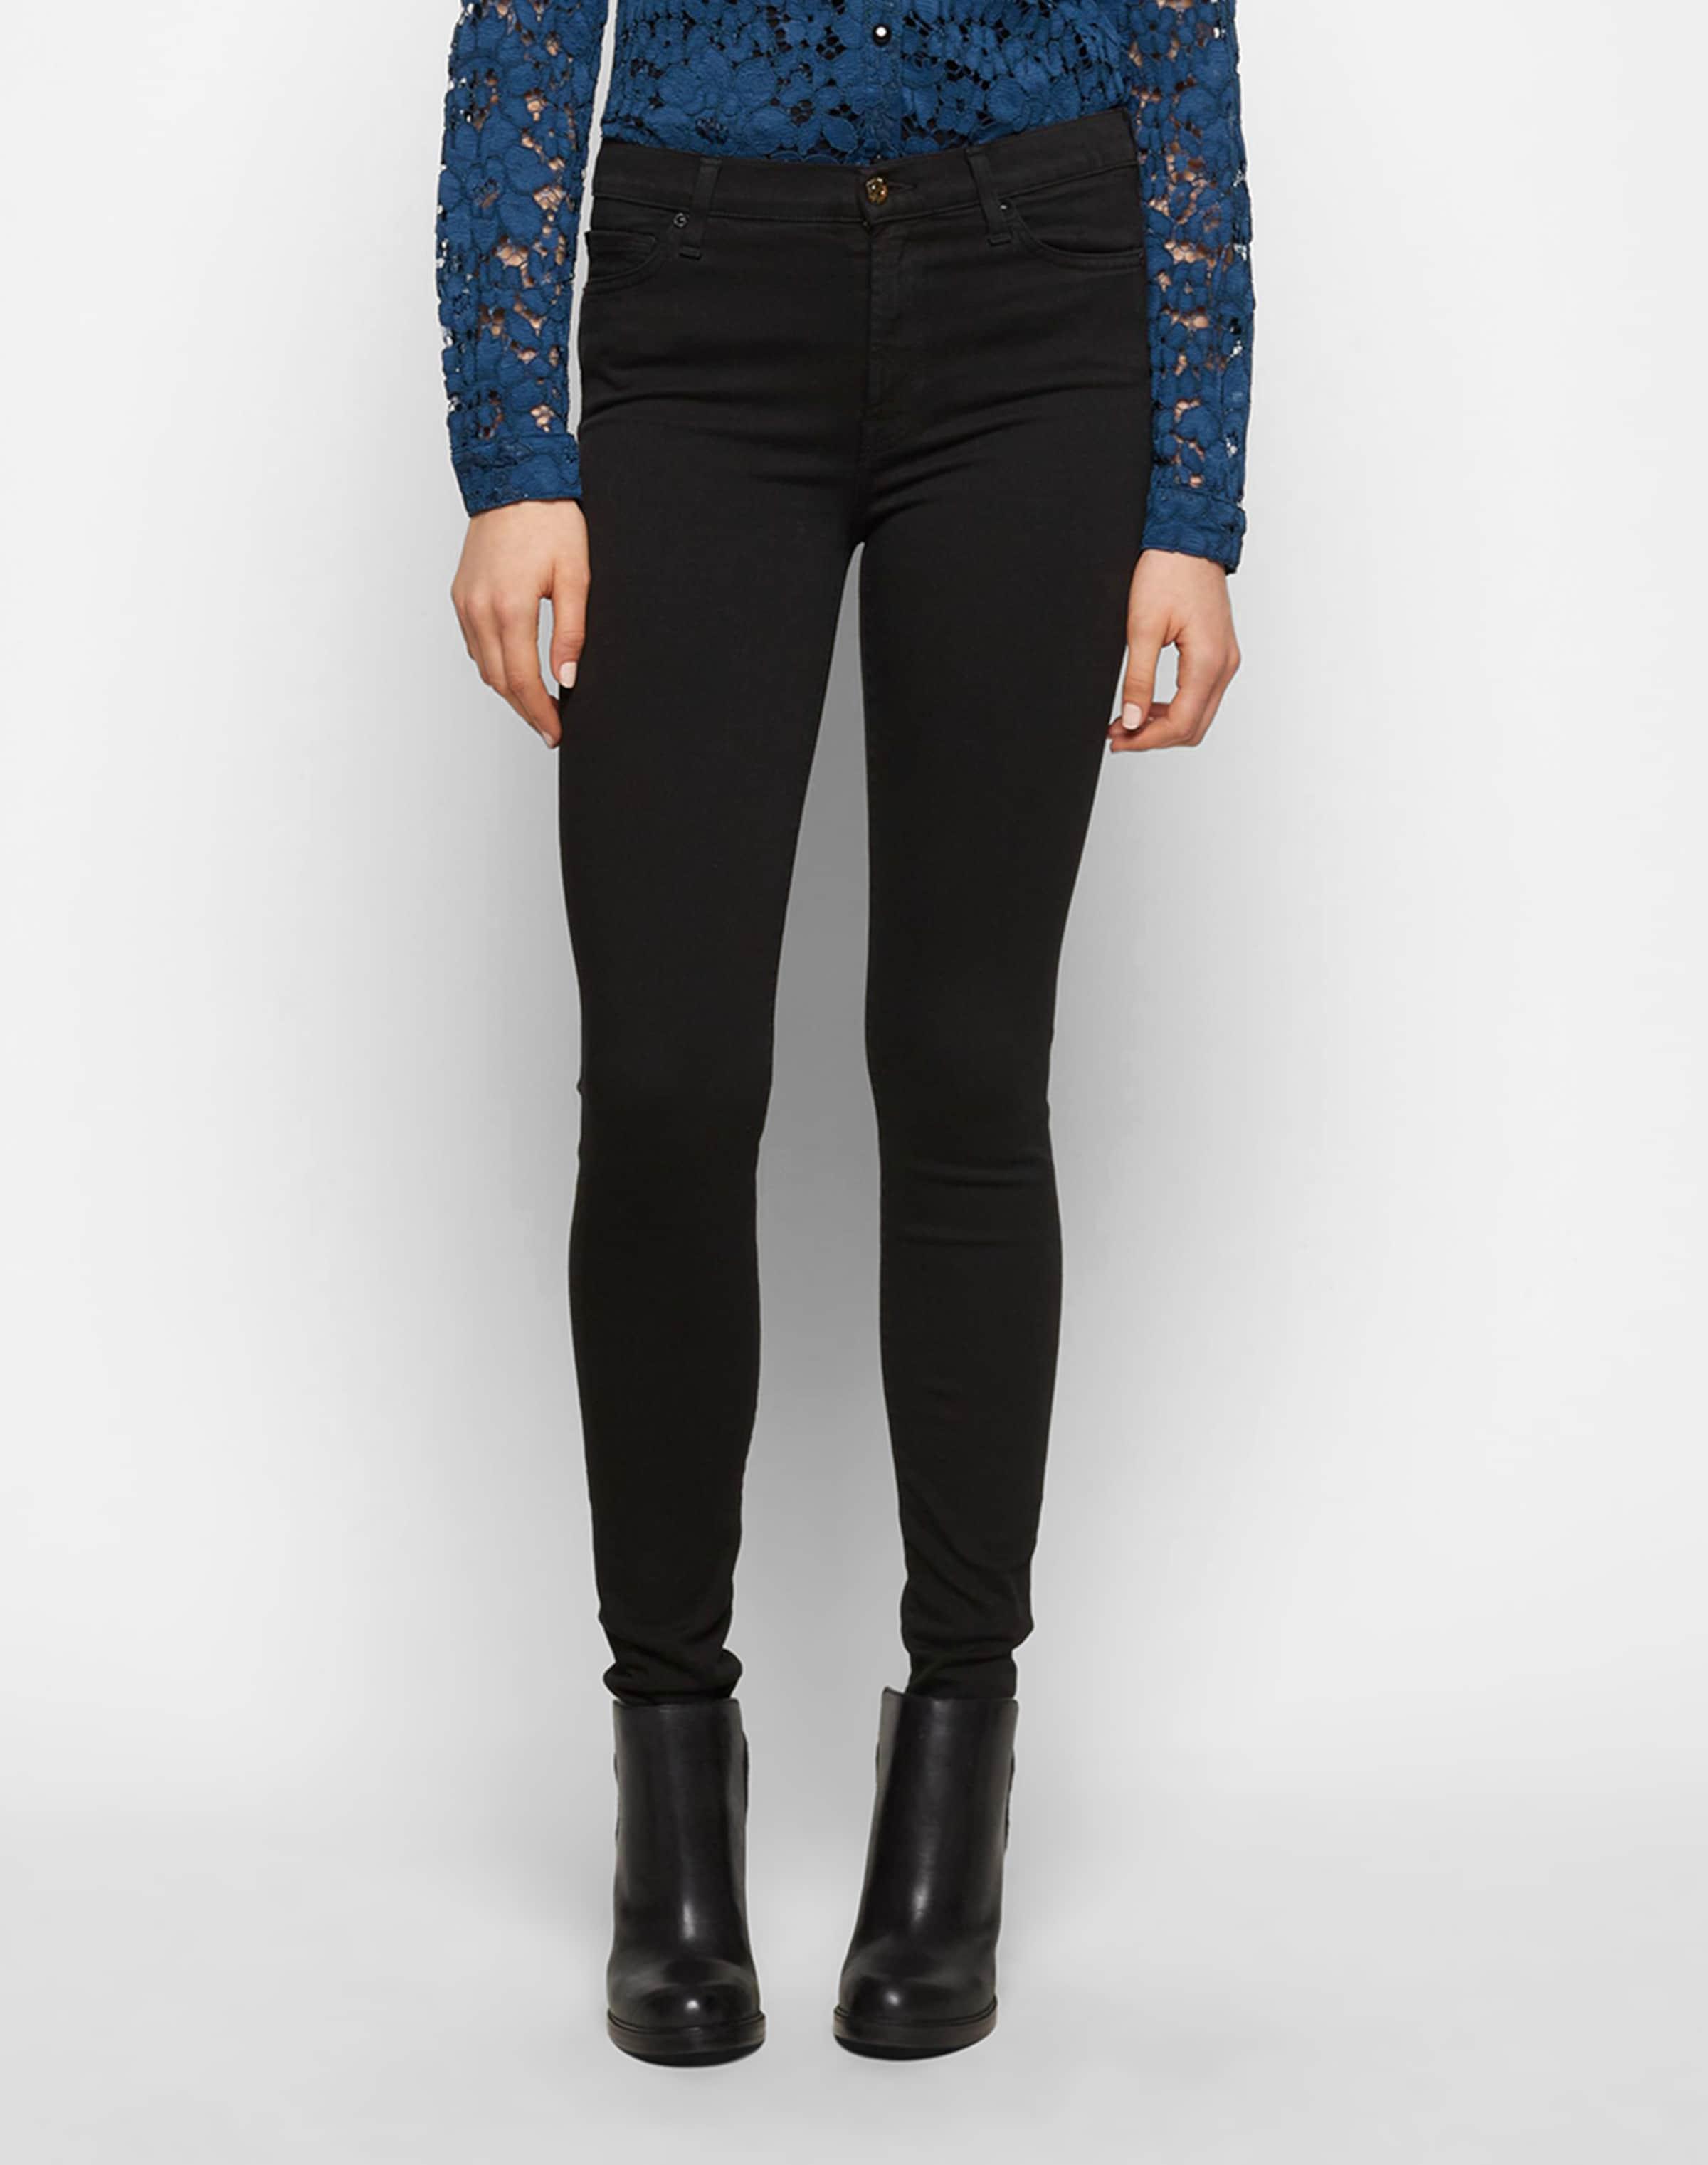 For Jeans 'hw 7 Schwarz All In Klassische Skinny Skinny' Mankind vONn0wm8